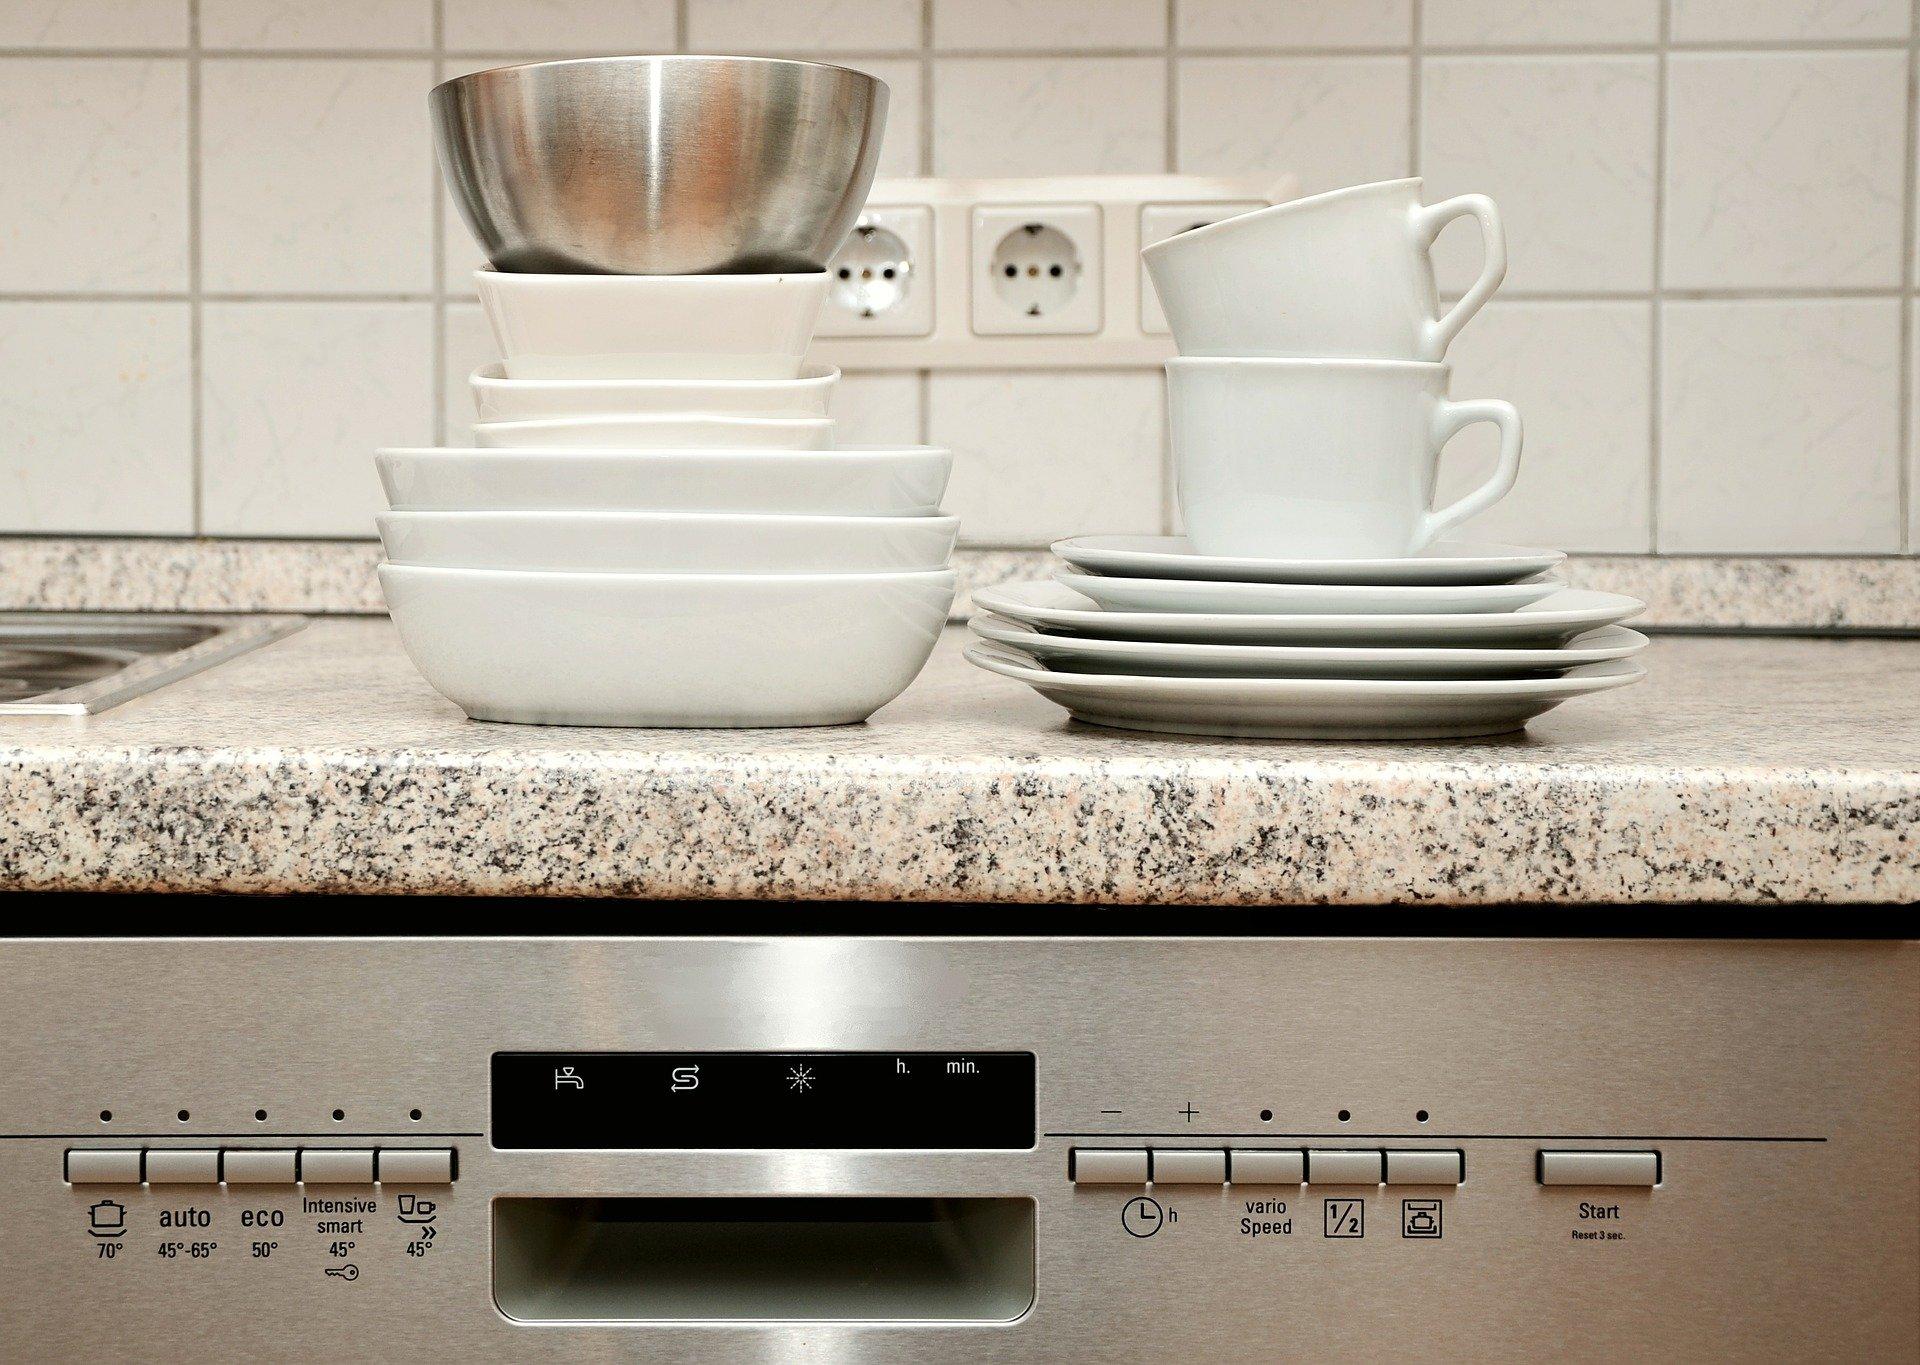 troubleshooting a stinky dishwasher